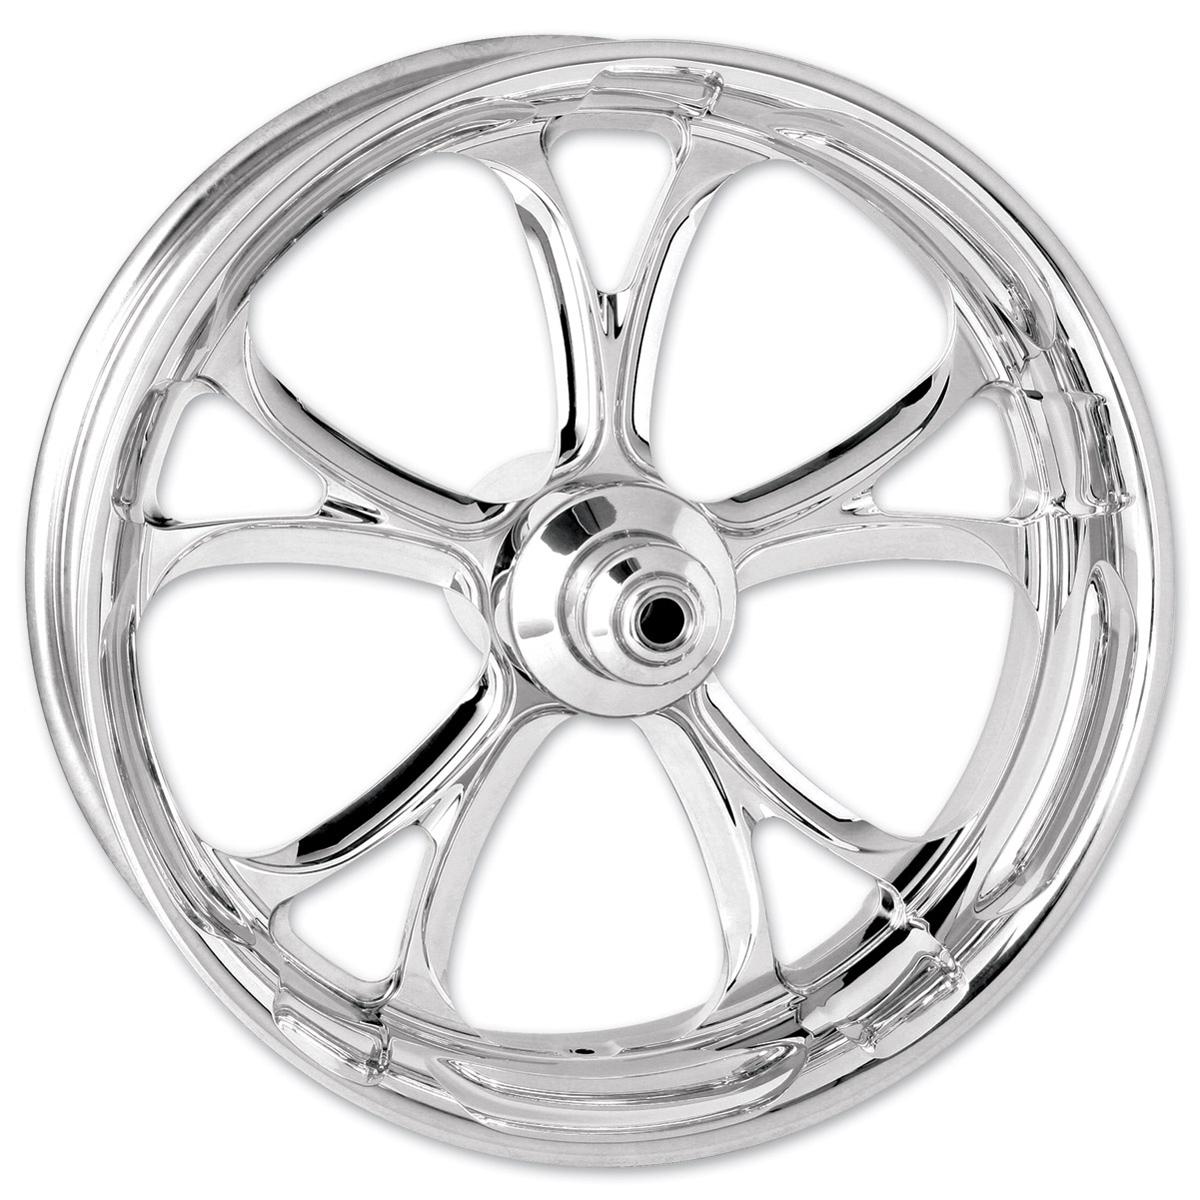 Performance Machine Luxe Chrome Rear Wheel 17x6